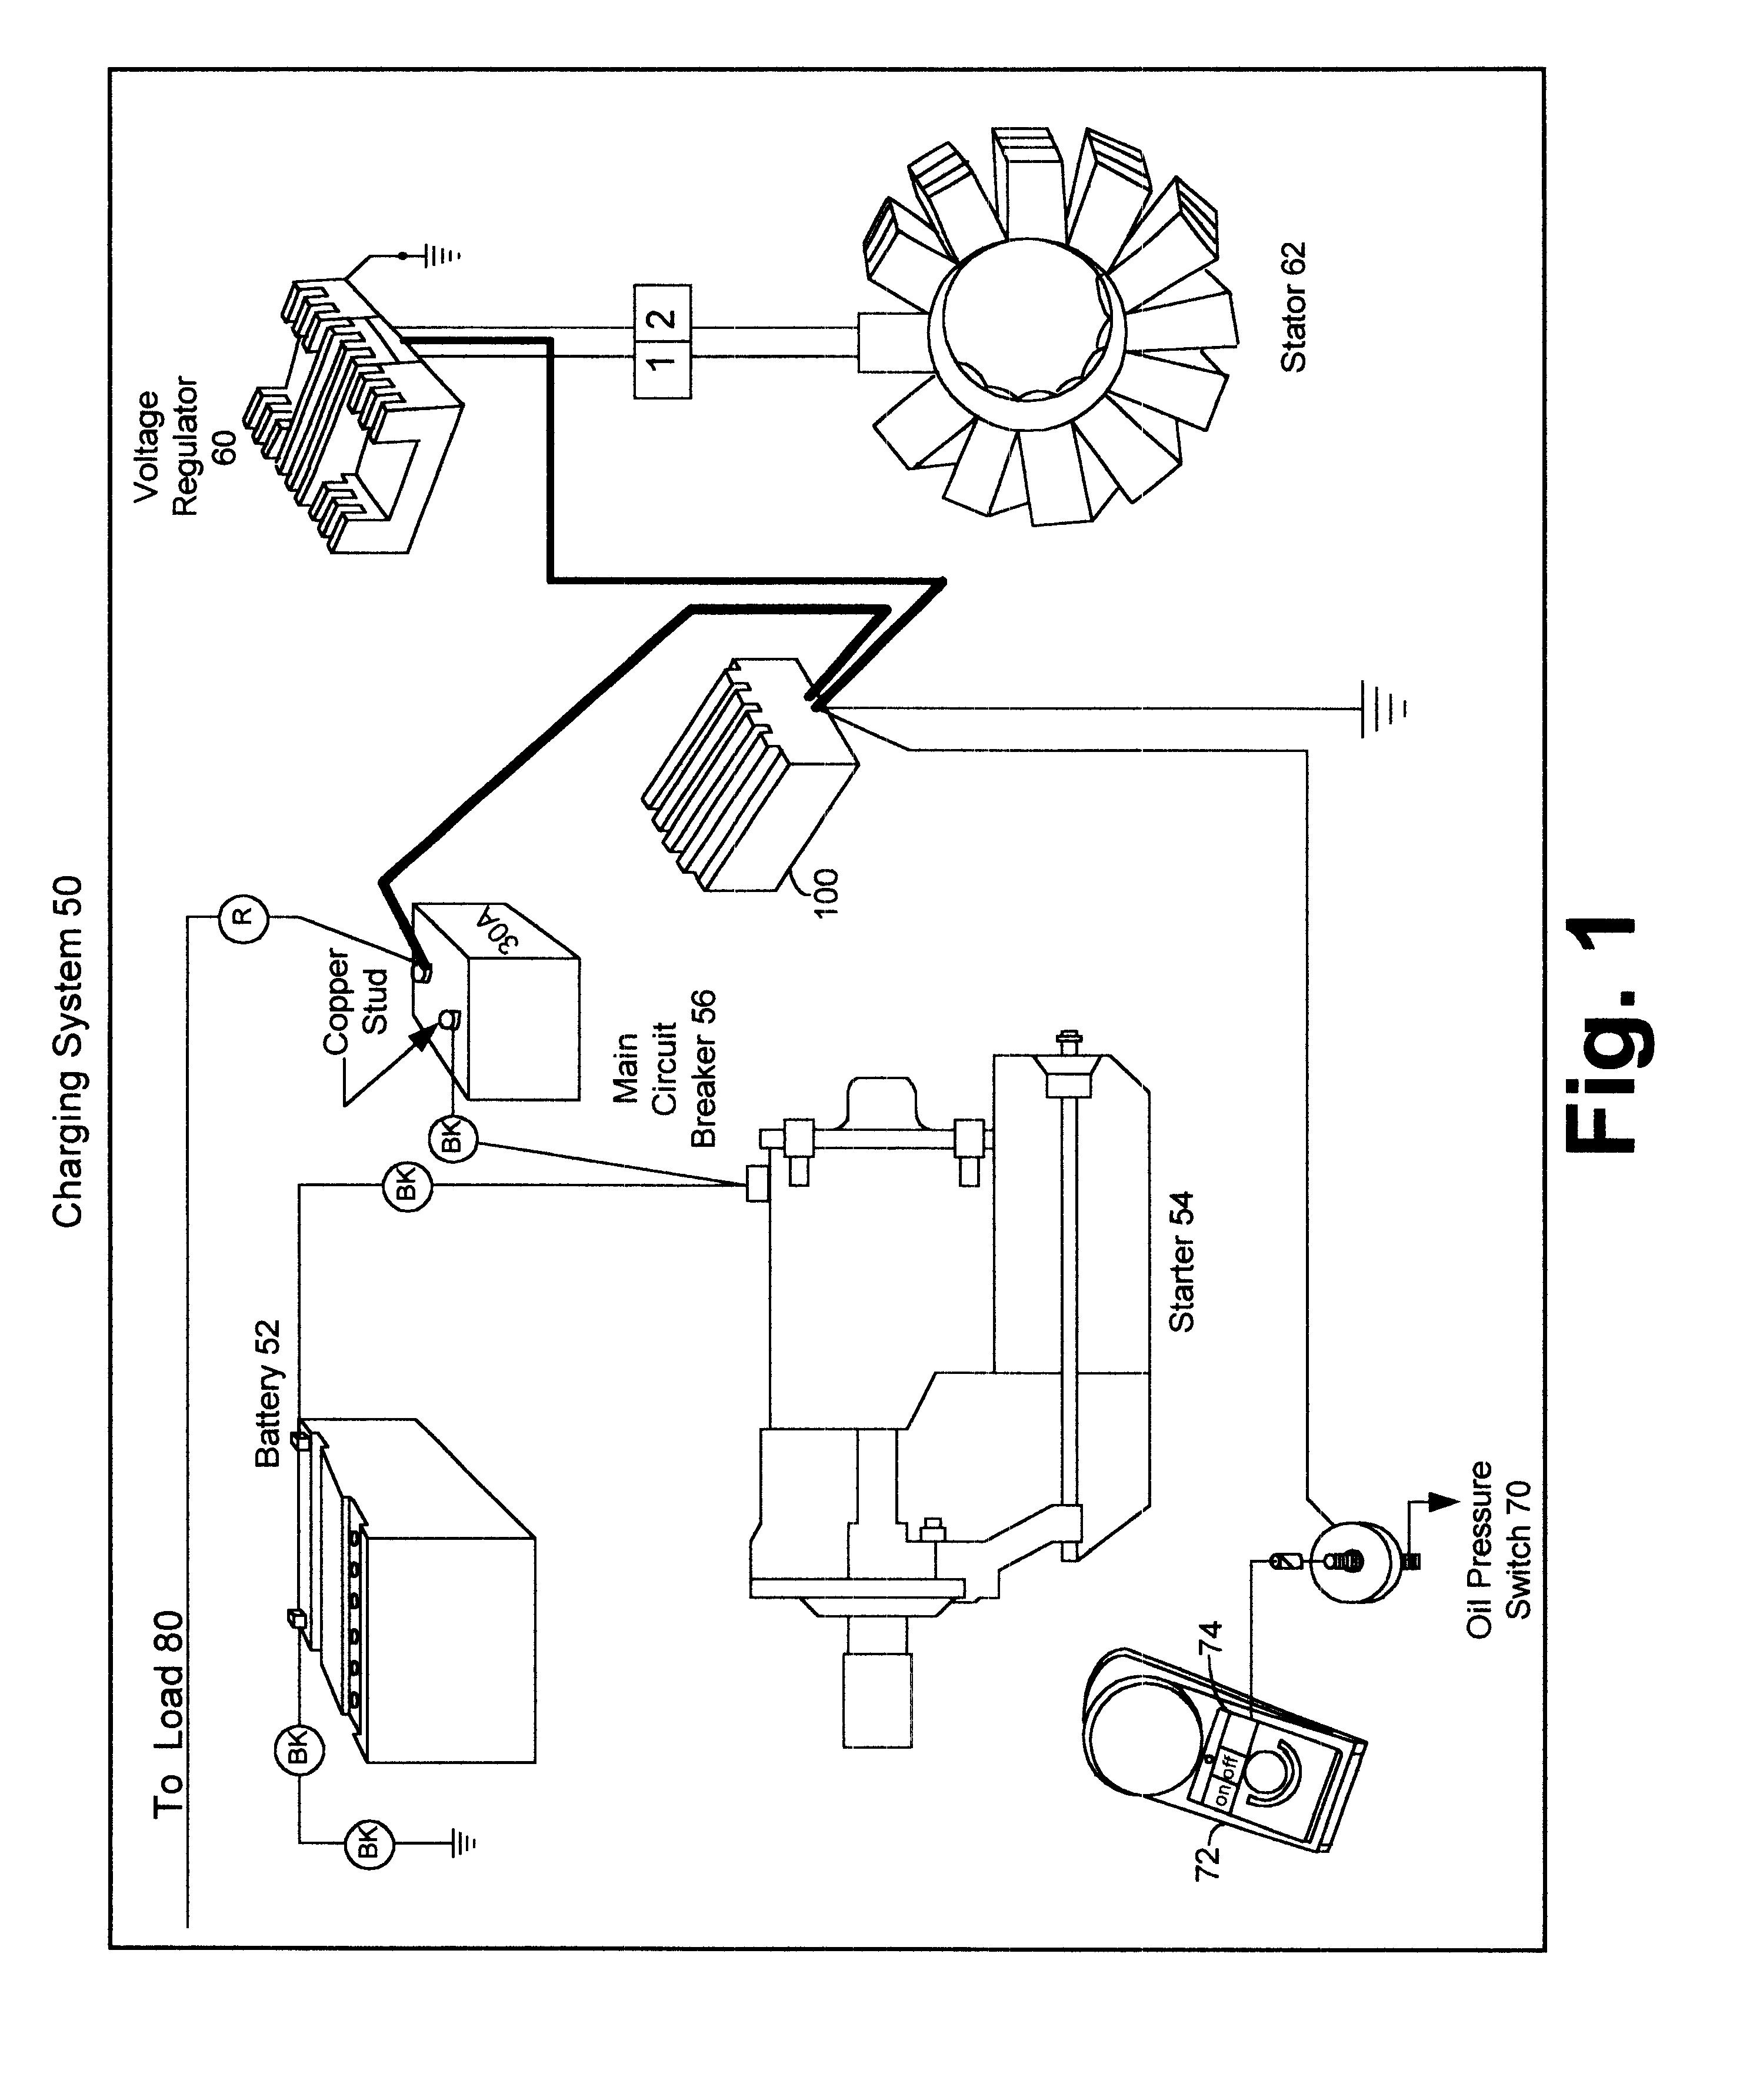 Harley Davidson Charging System Diagram Solution Of Your Wiring Evolution Engine Patentimages Storage Googleapis Com Us6496109b1 Us Rh Stardrop Store Evo